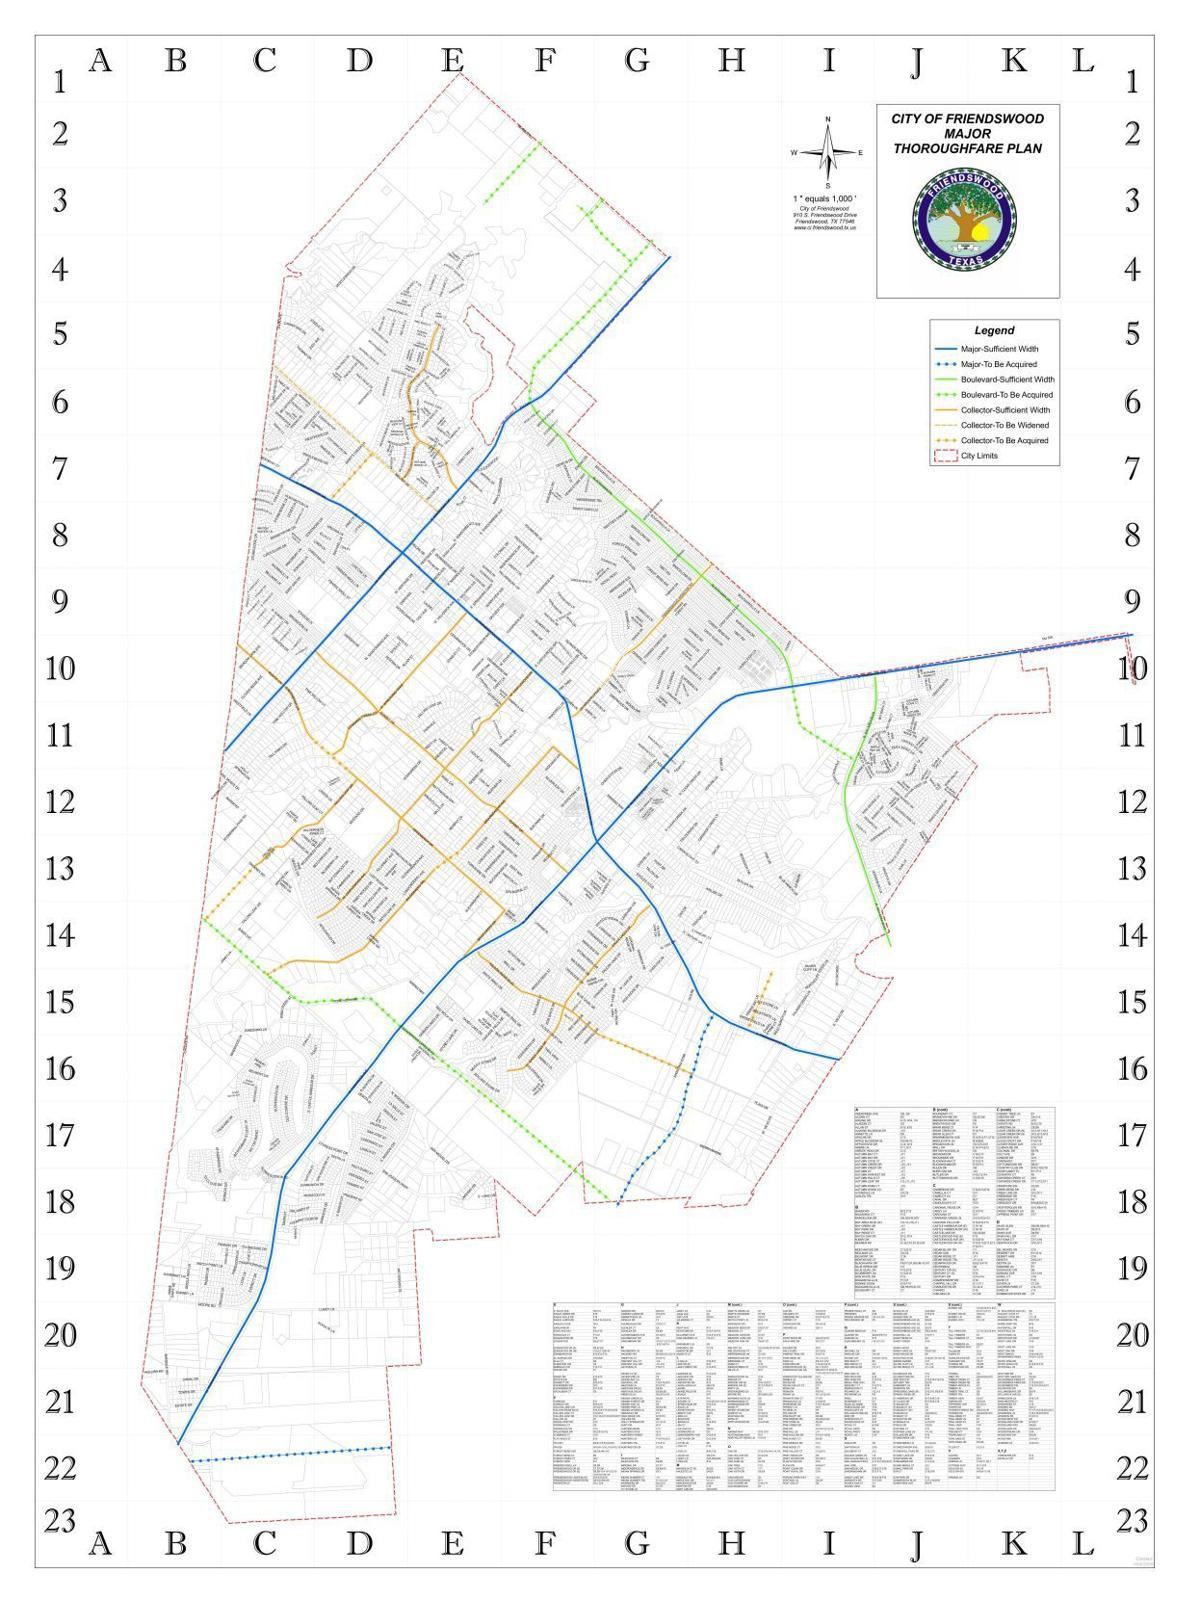 Friendswood Major Thoroughfare Plan